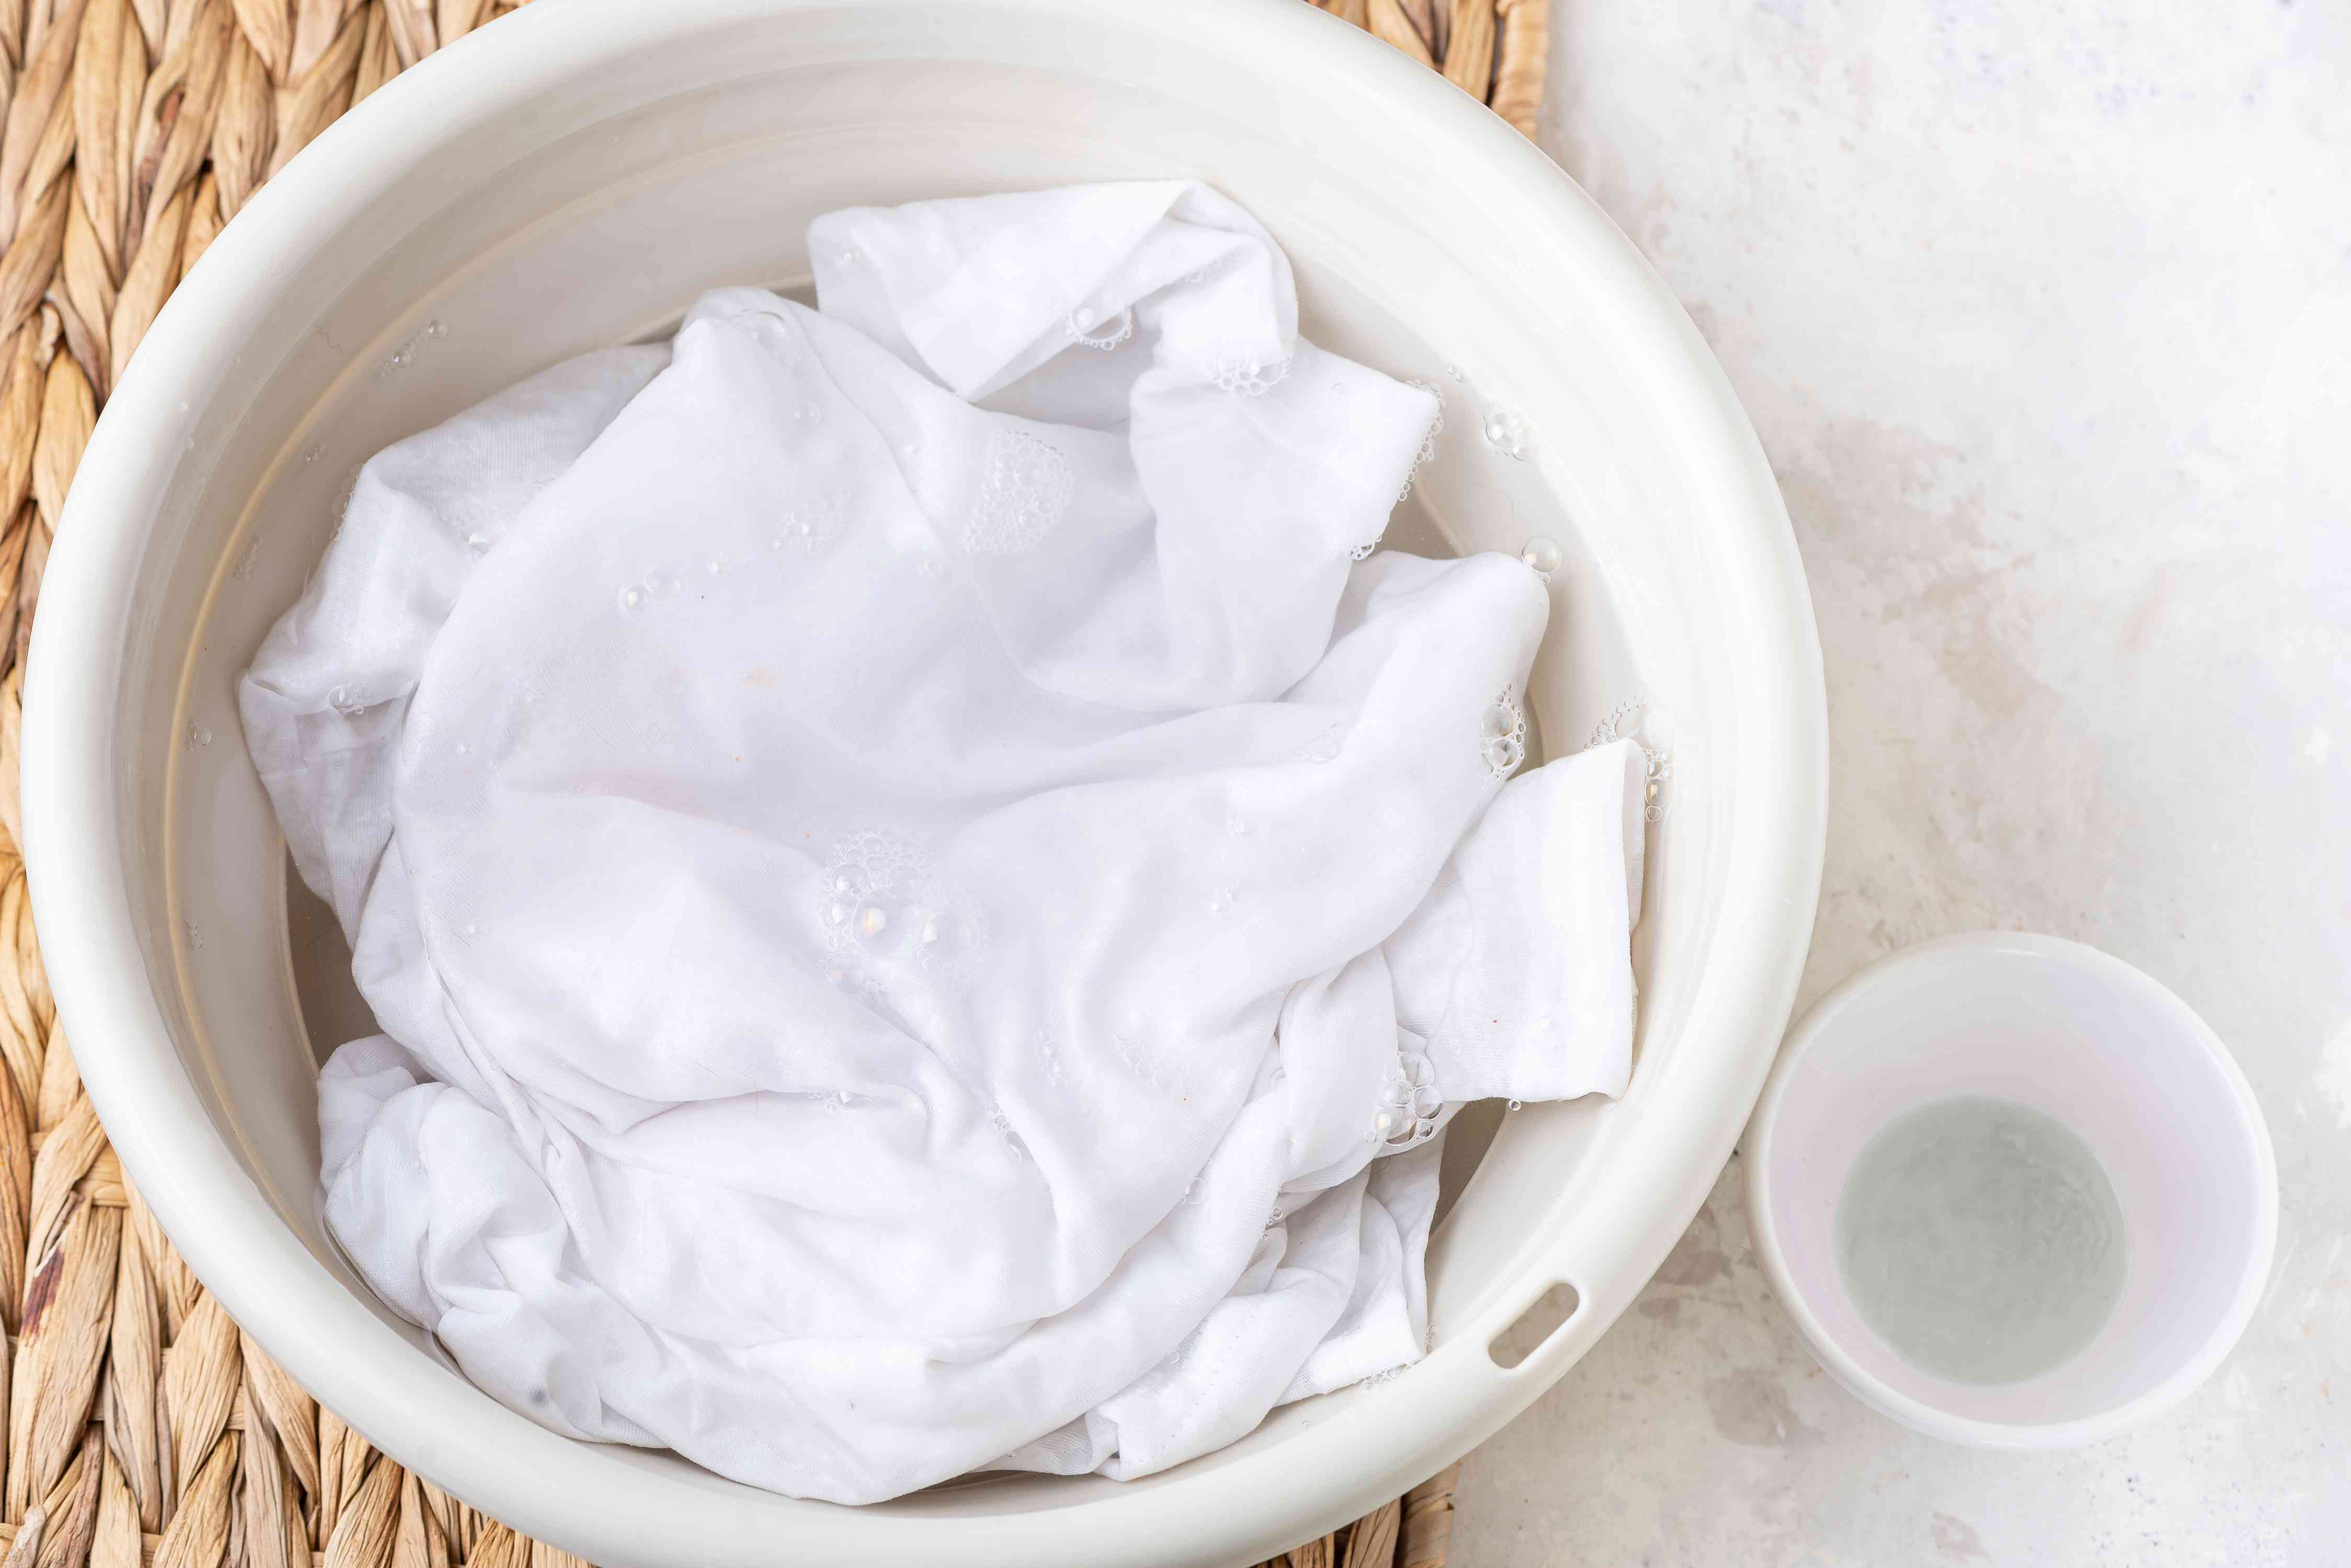 soaking the garment in an oxygen bleach solution